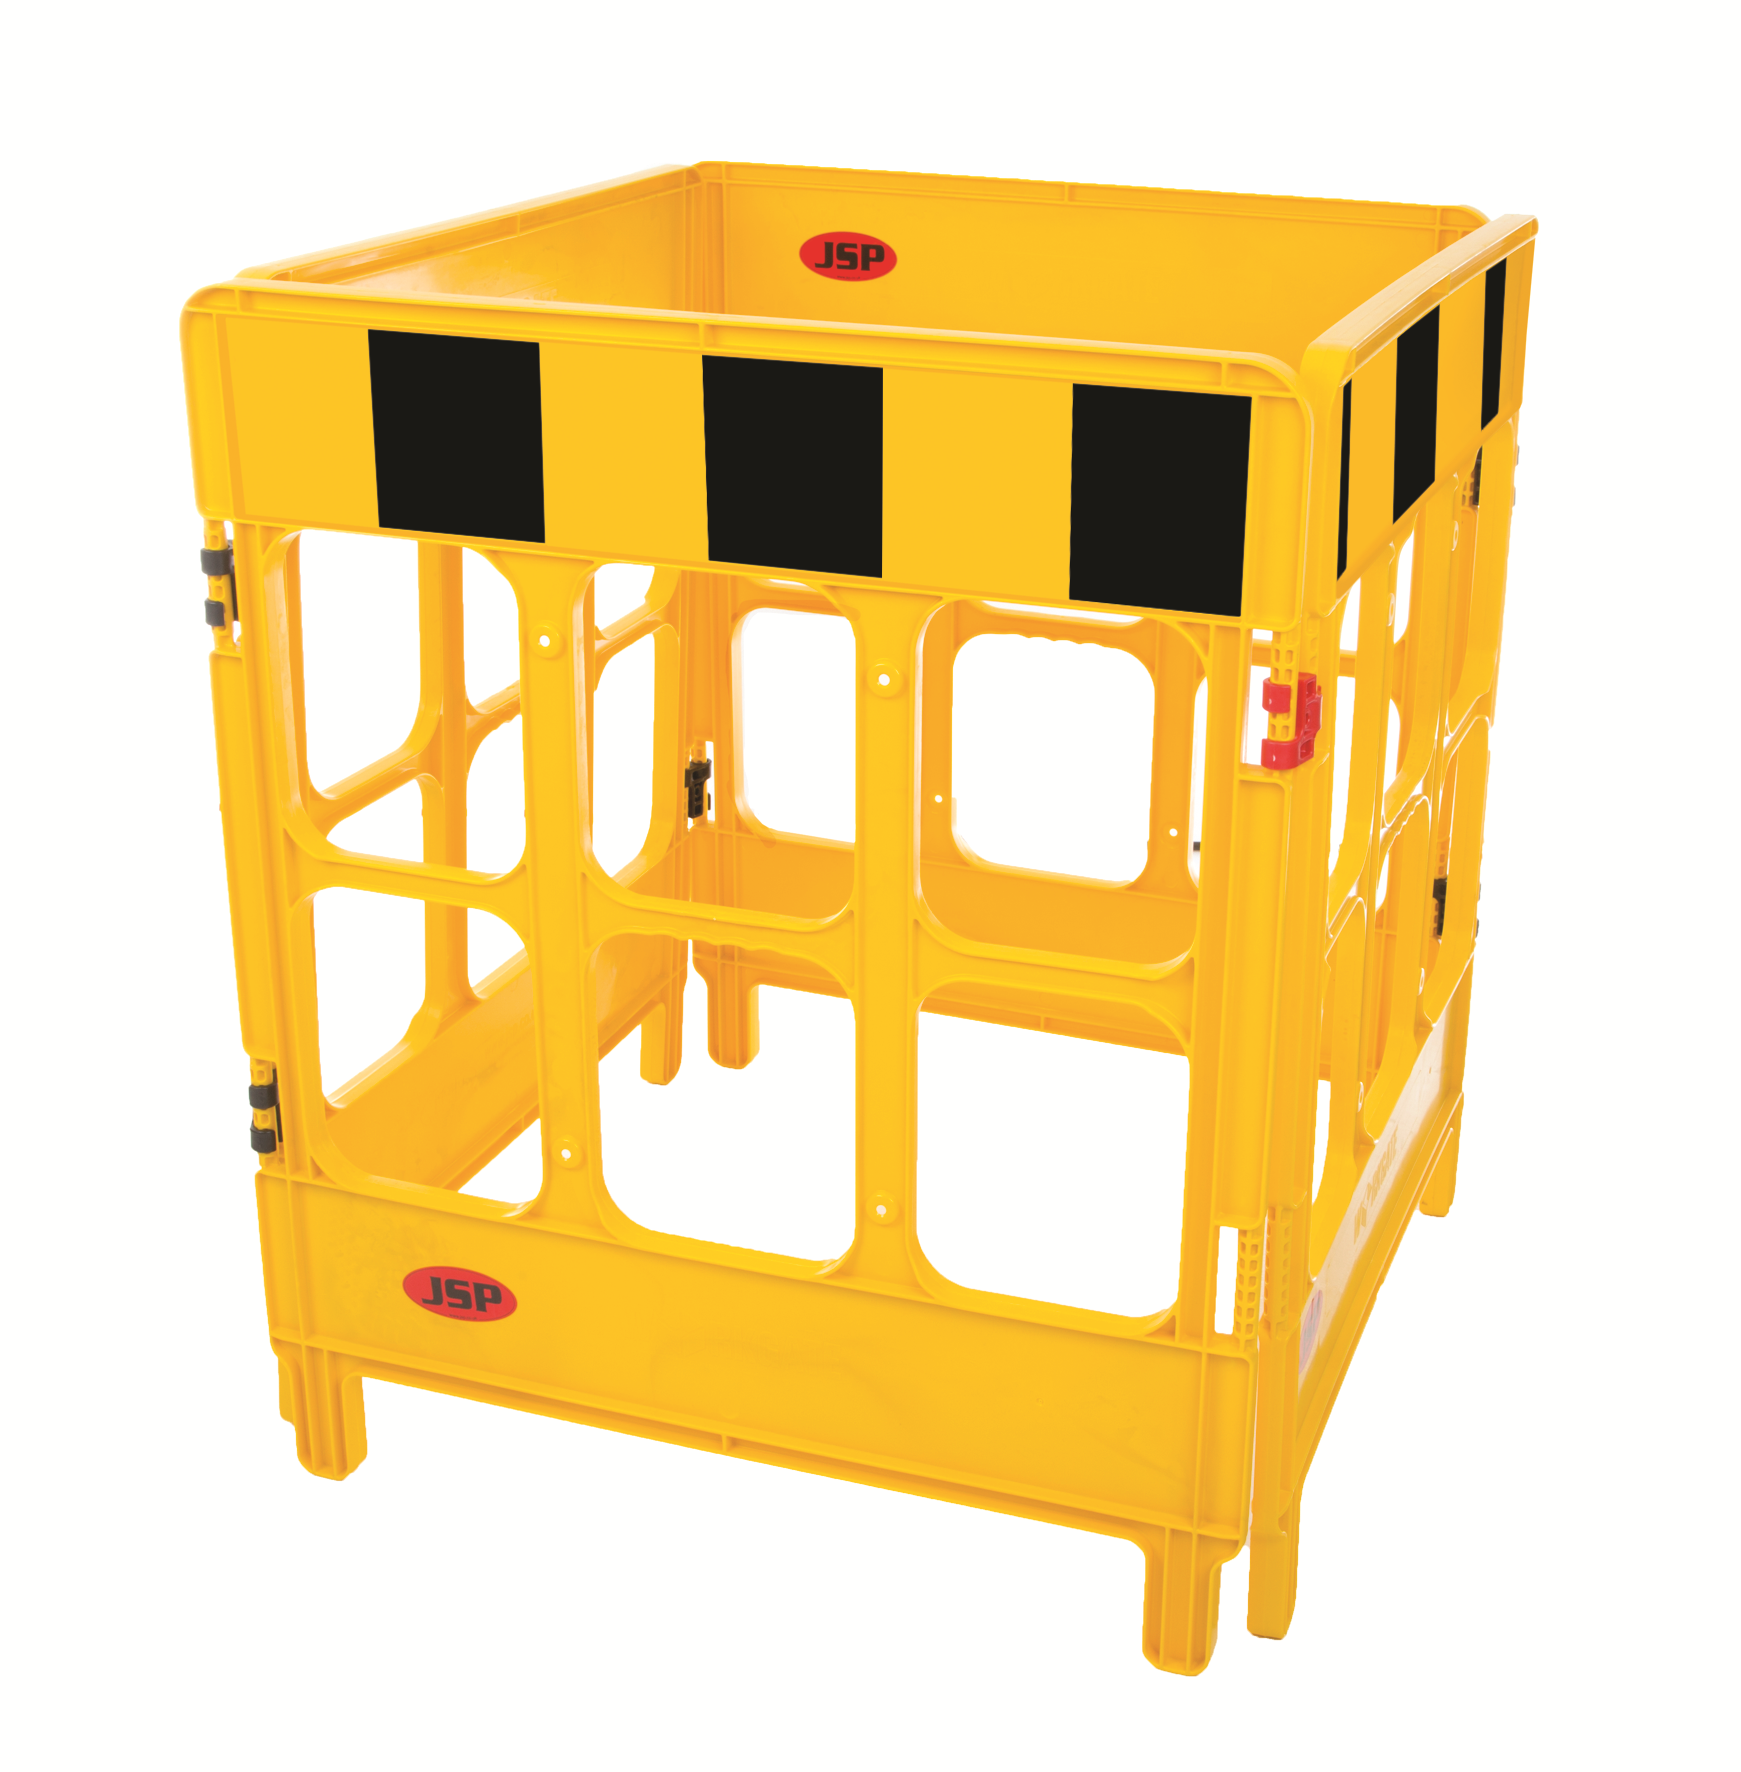 JSP 4-gate foldable polypropylene work barriers